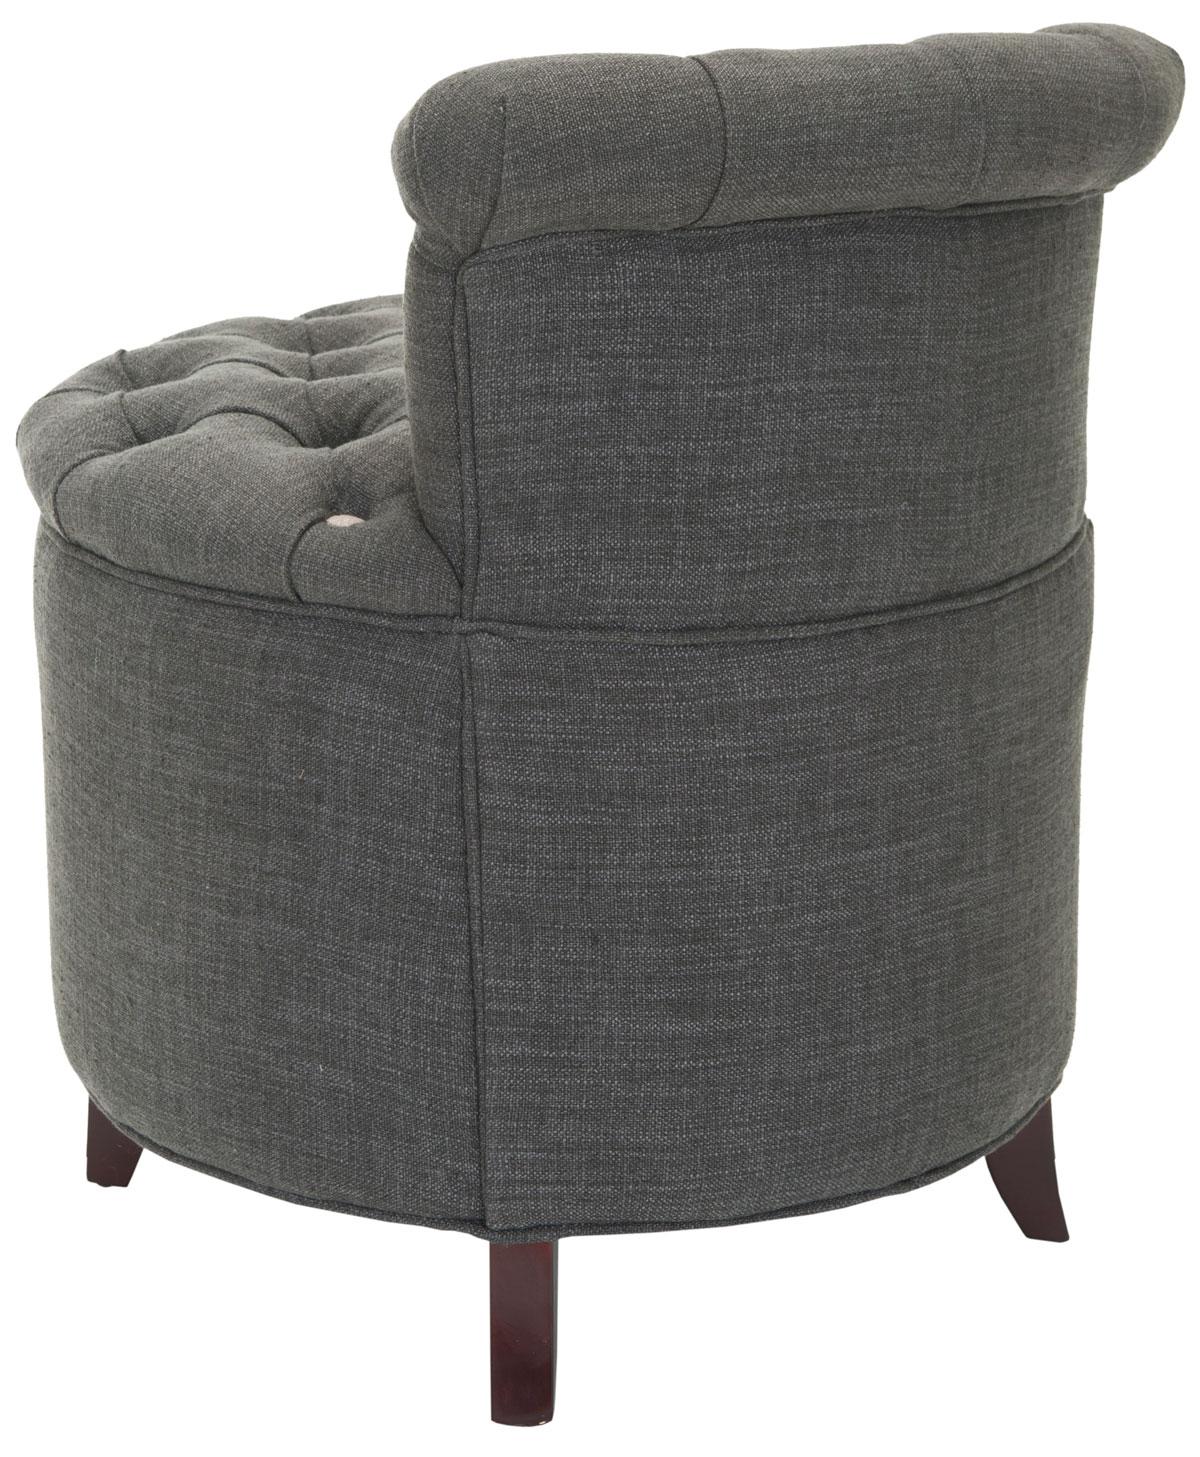 mcr4518a vanity stools furniture by safavieh